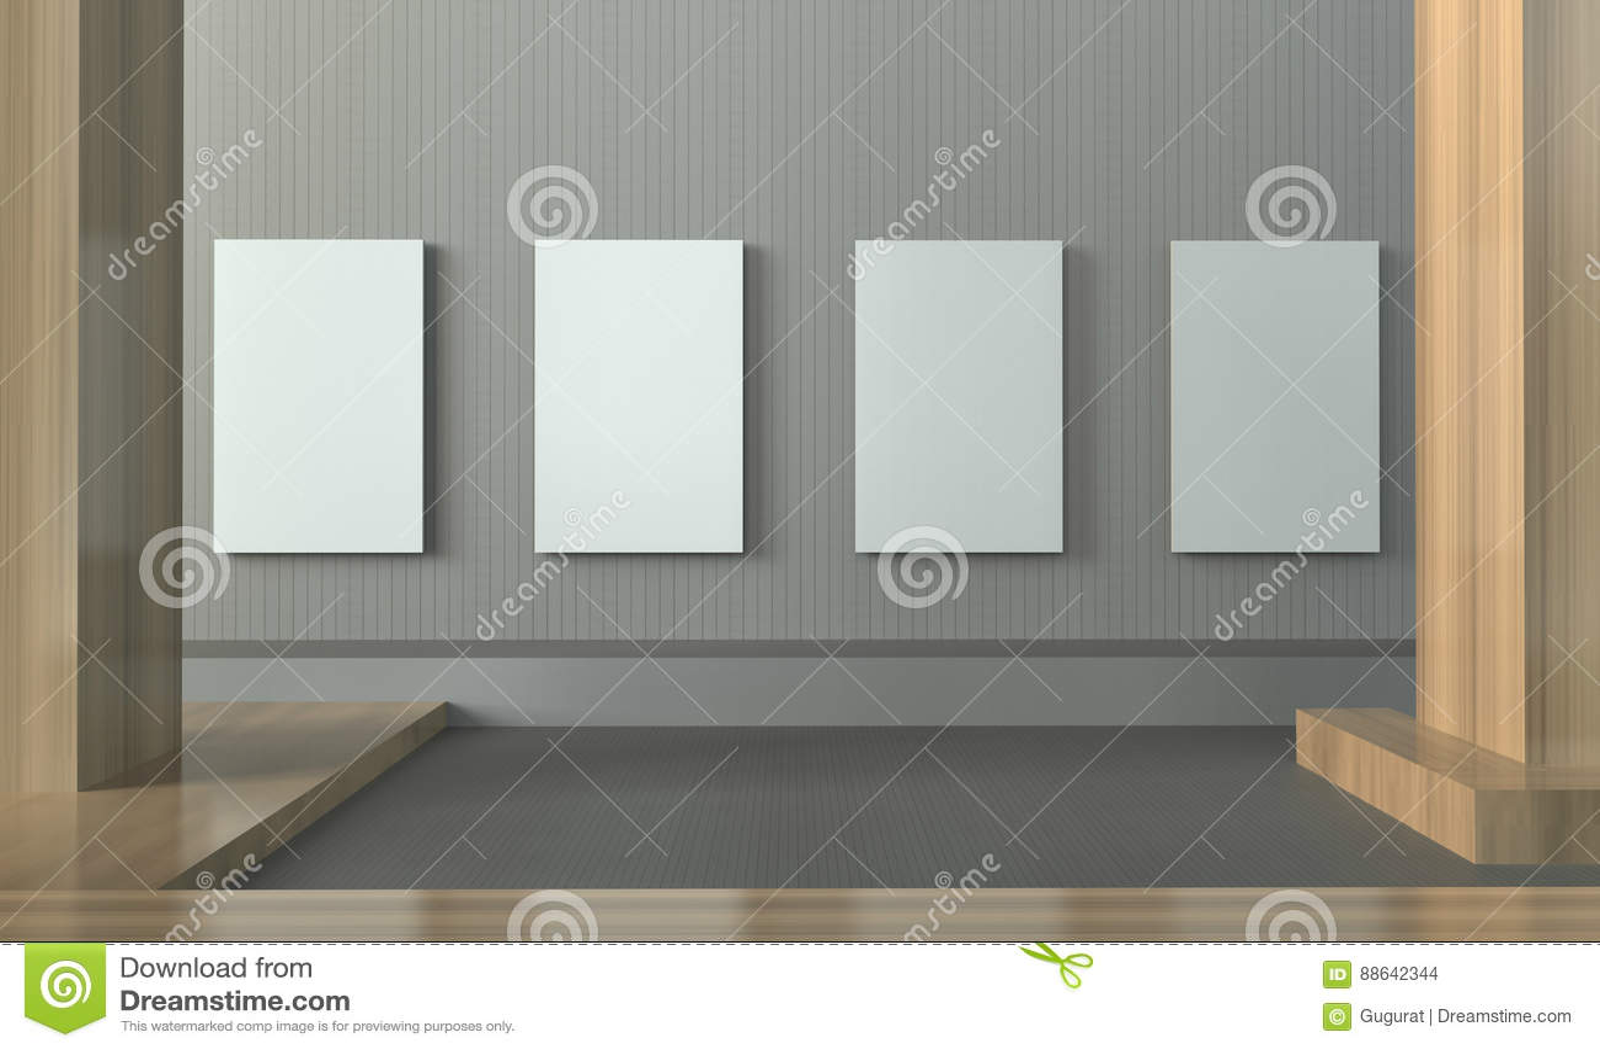 Mur Propre Et Minimal D\'exposition De Galerie De Cadre De Tableau De ...